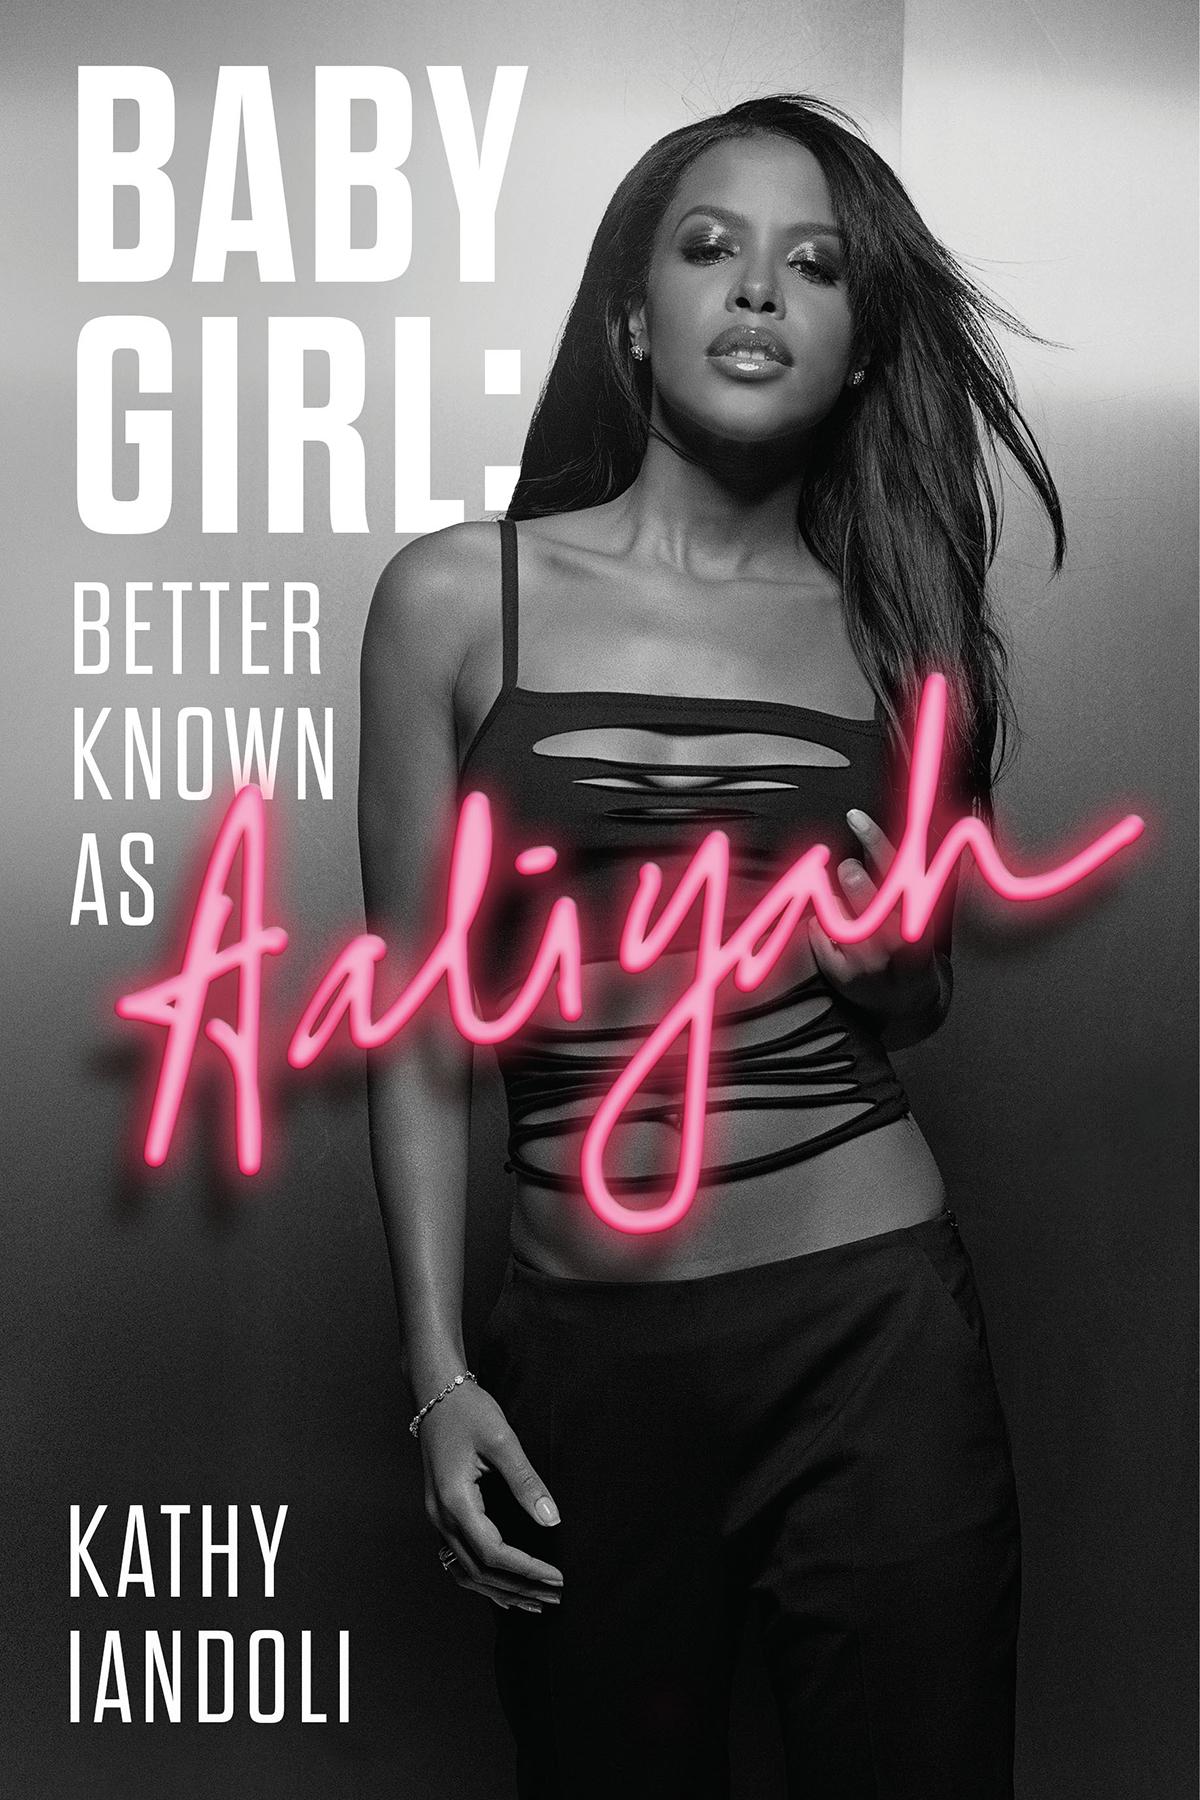 baby girl aaliyah book